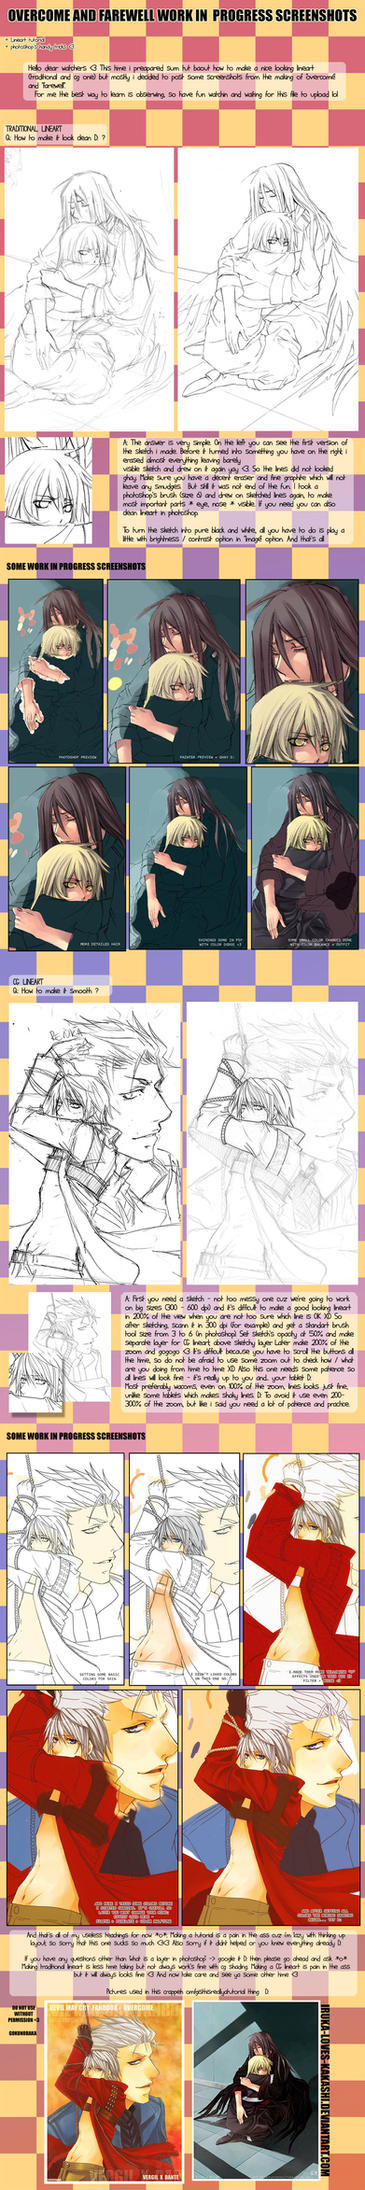 +LINEART tutorial and WIP + by goku-no-baka